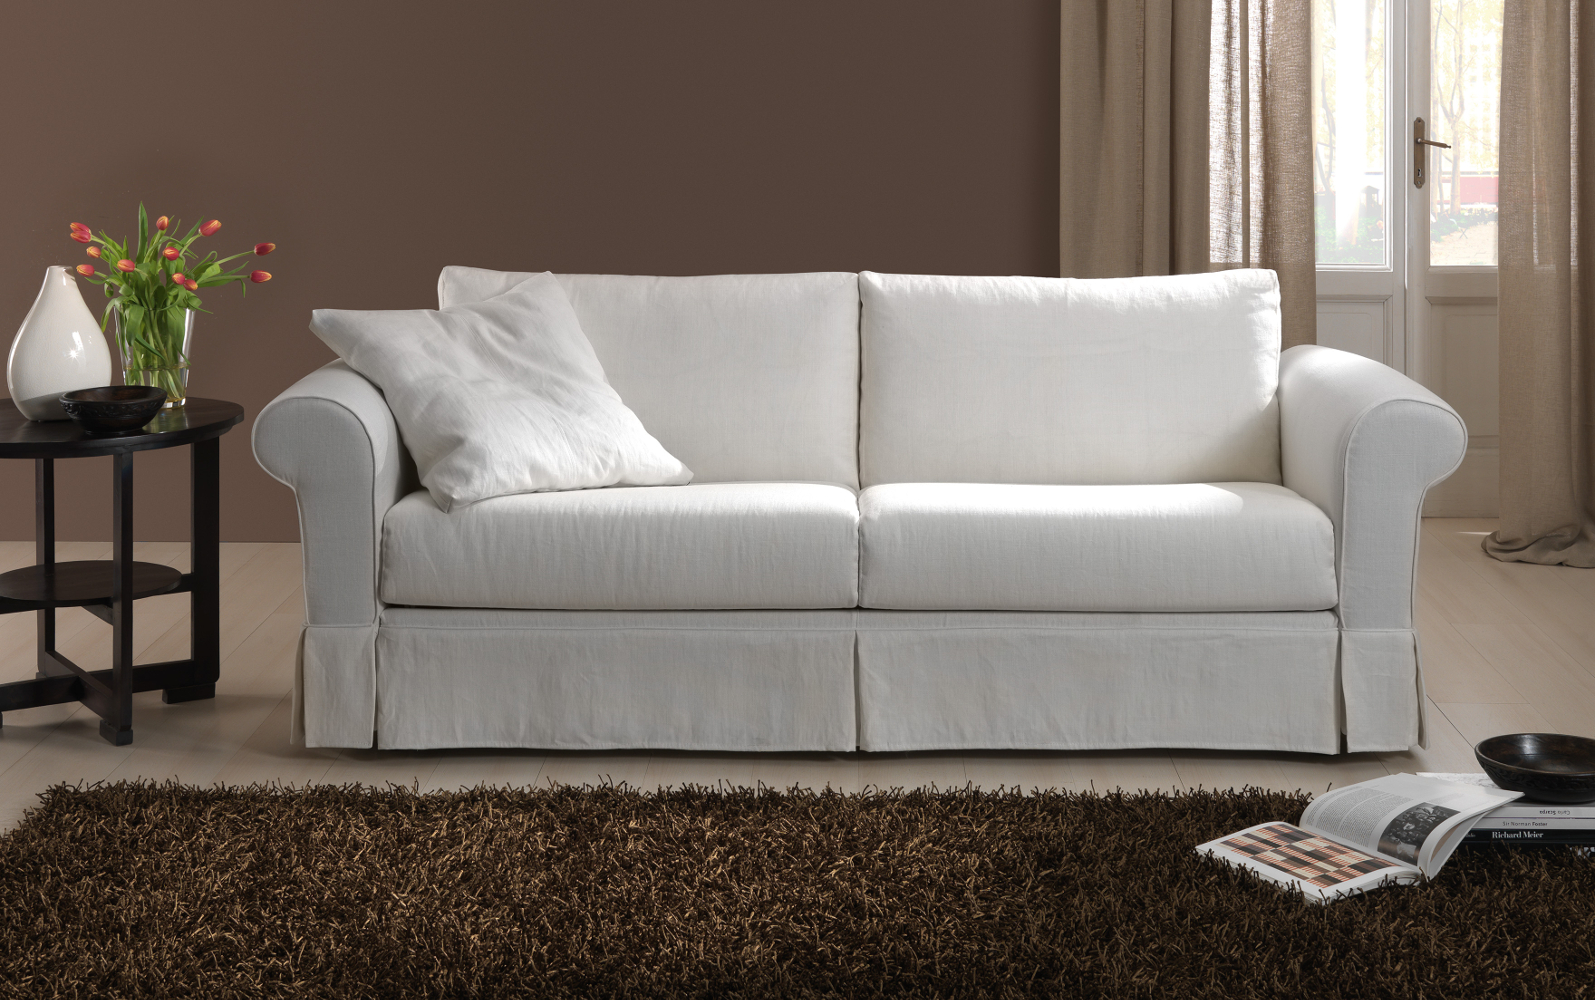 mercurio classic. Black Bedroom Furniture Sets. Home Design Ideas